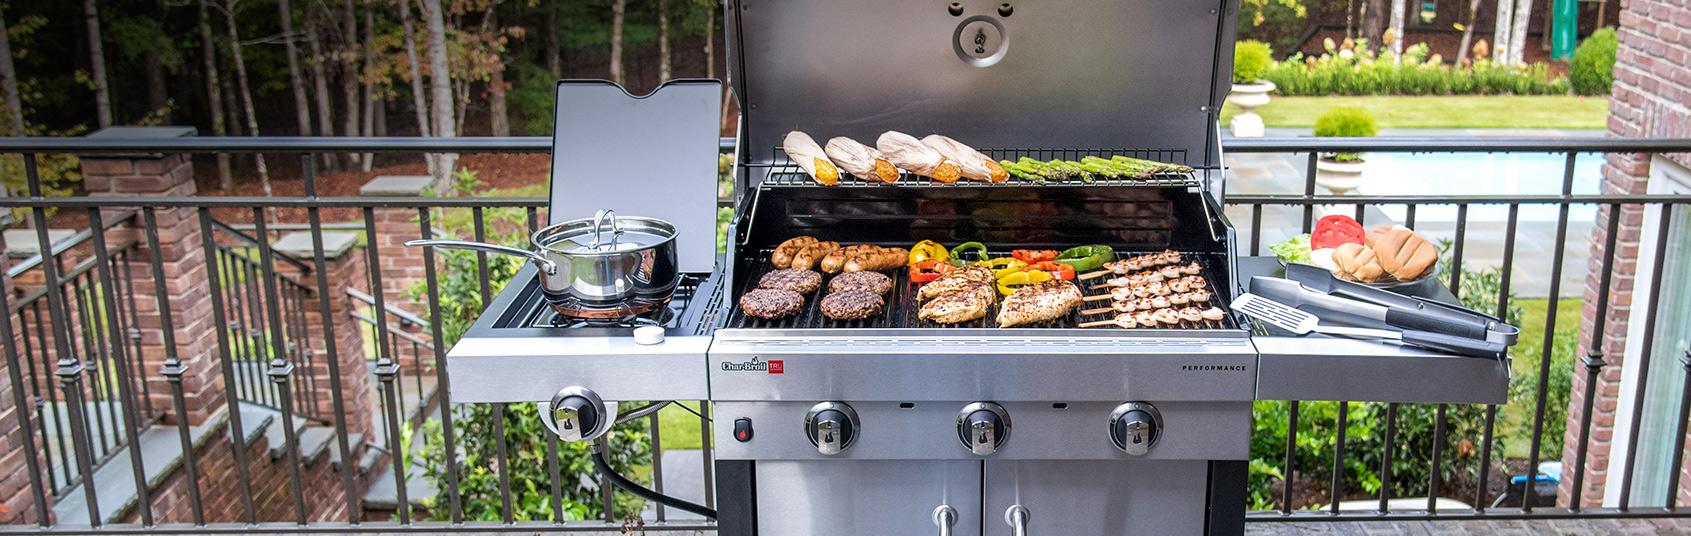 outdoor grill grills RIWLXPB